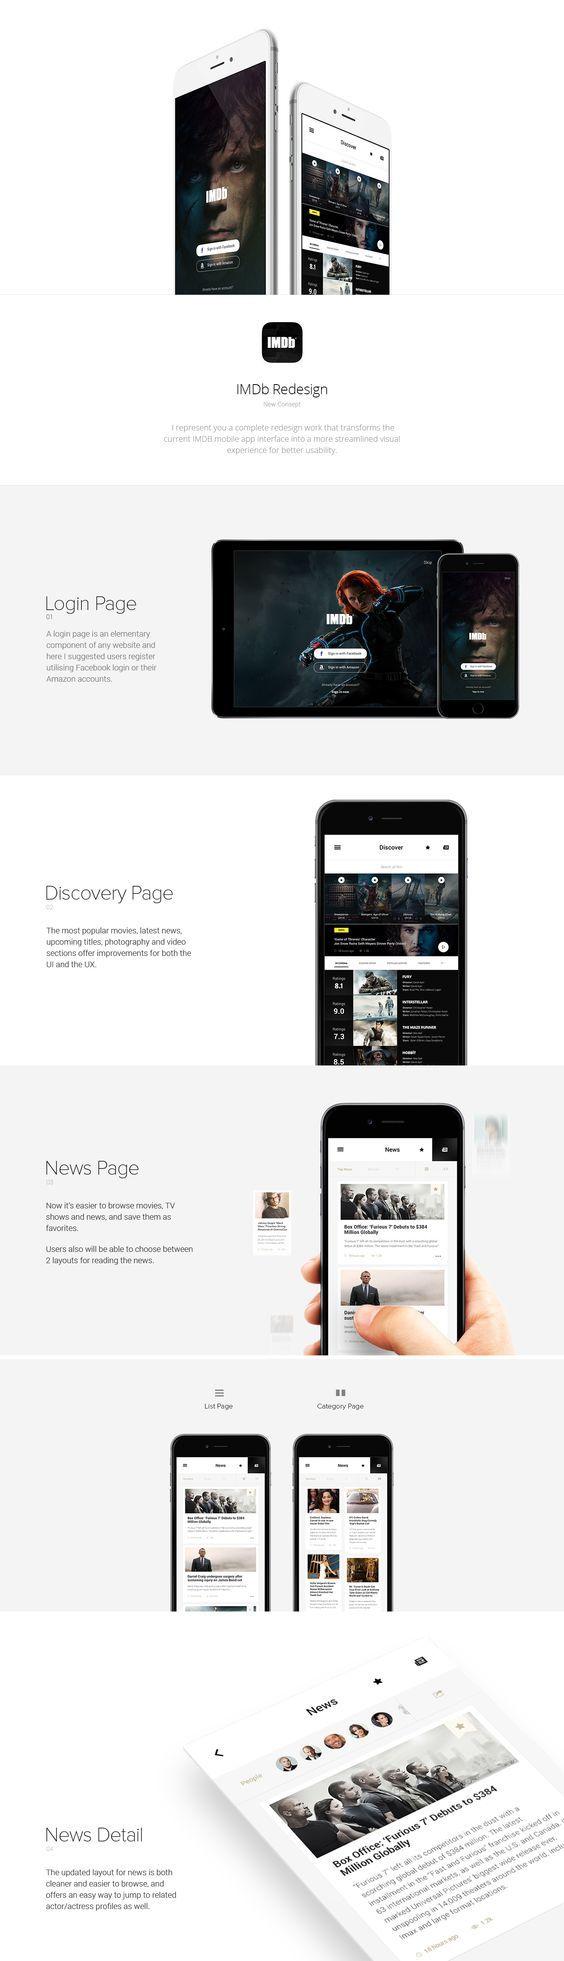 IMDb Mobile App Redesign on Behance: